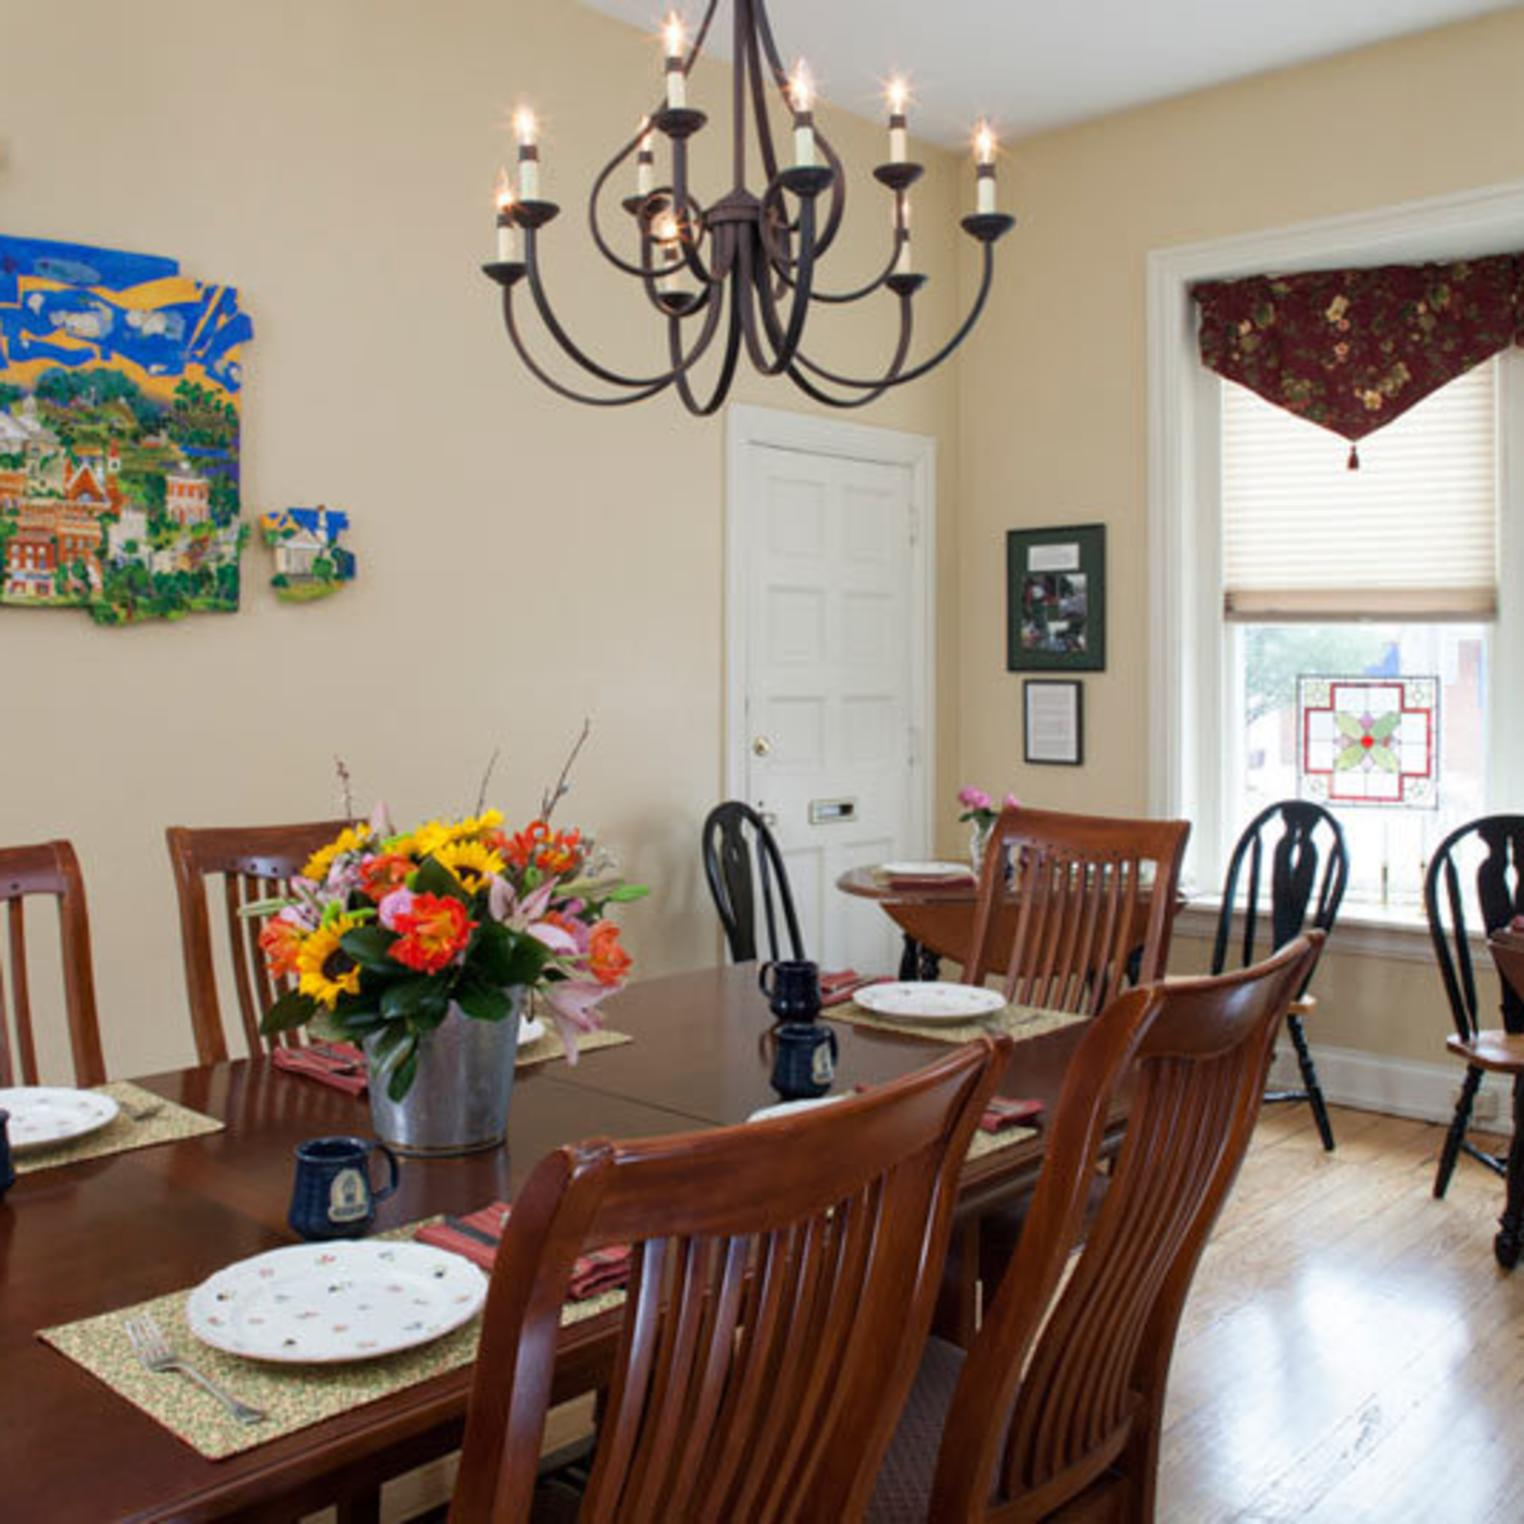 Enjoy Breakfast in the Dining Room